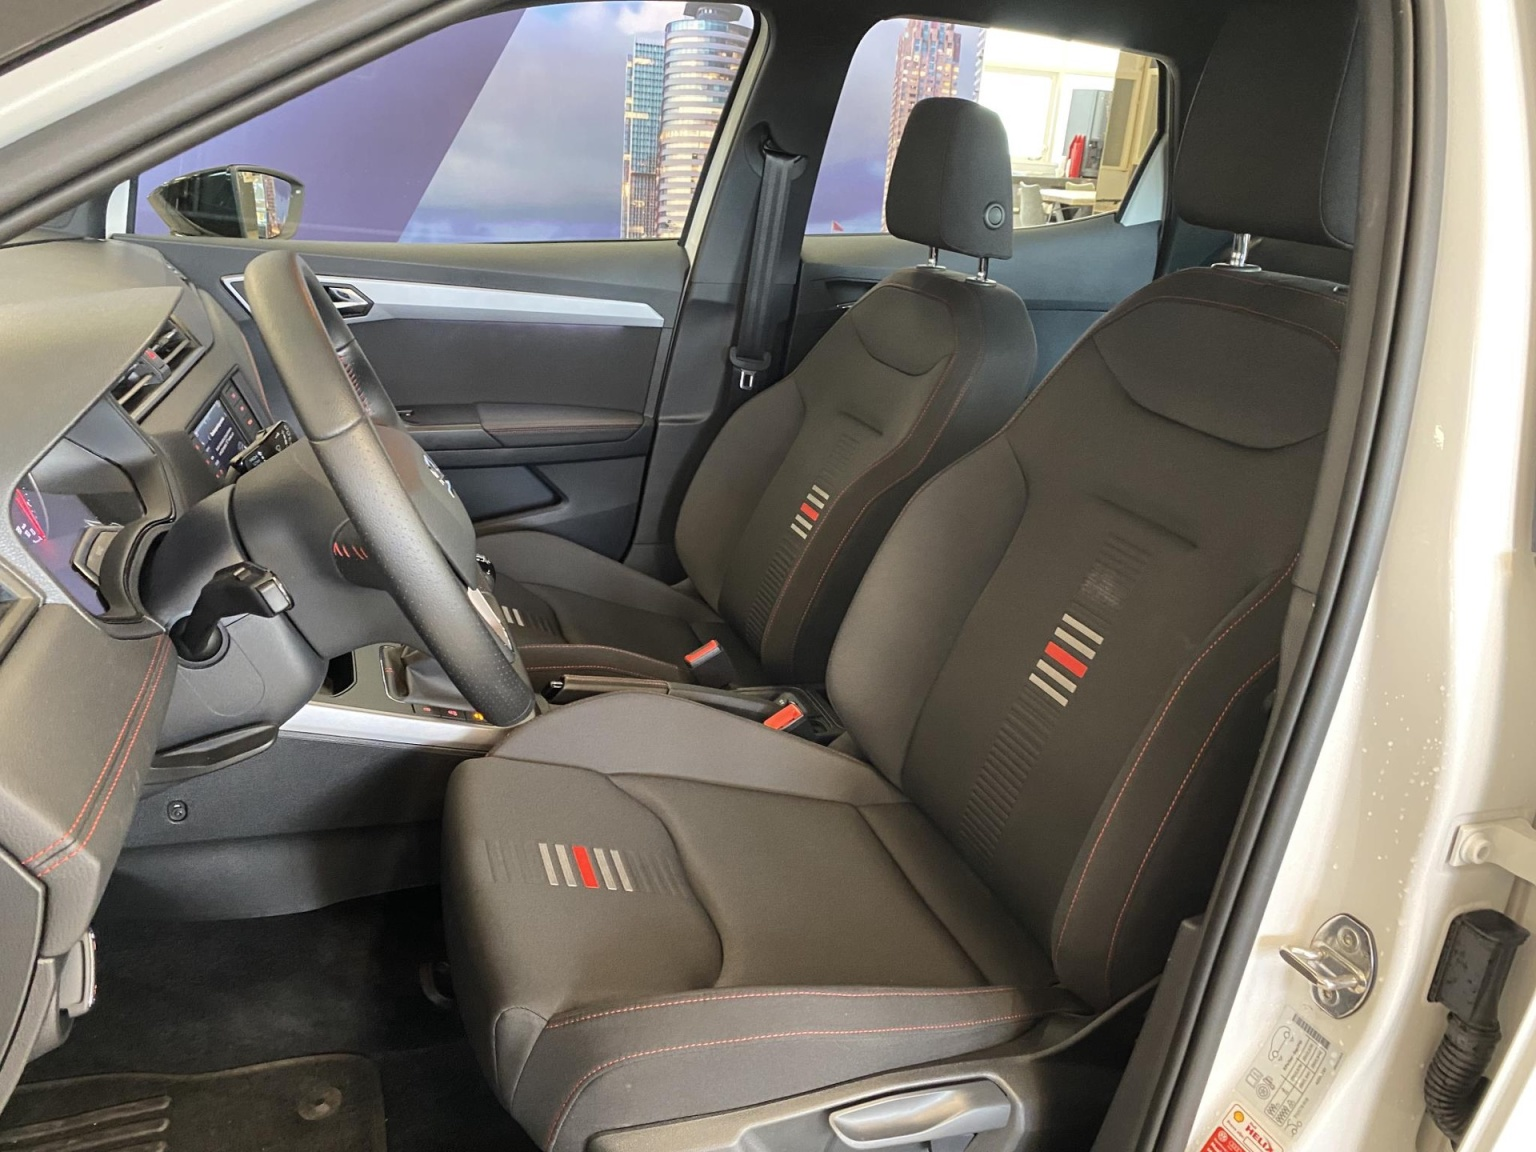 SEAT-Arona-11